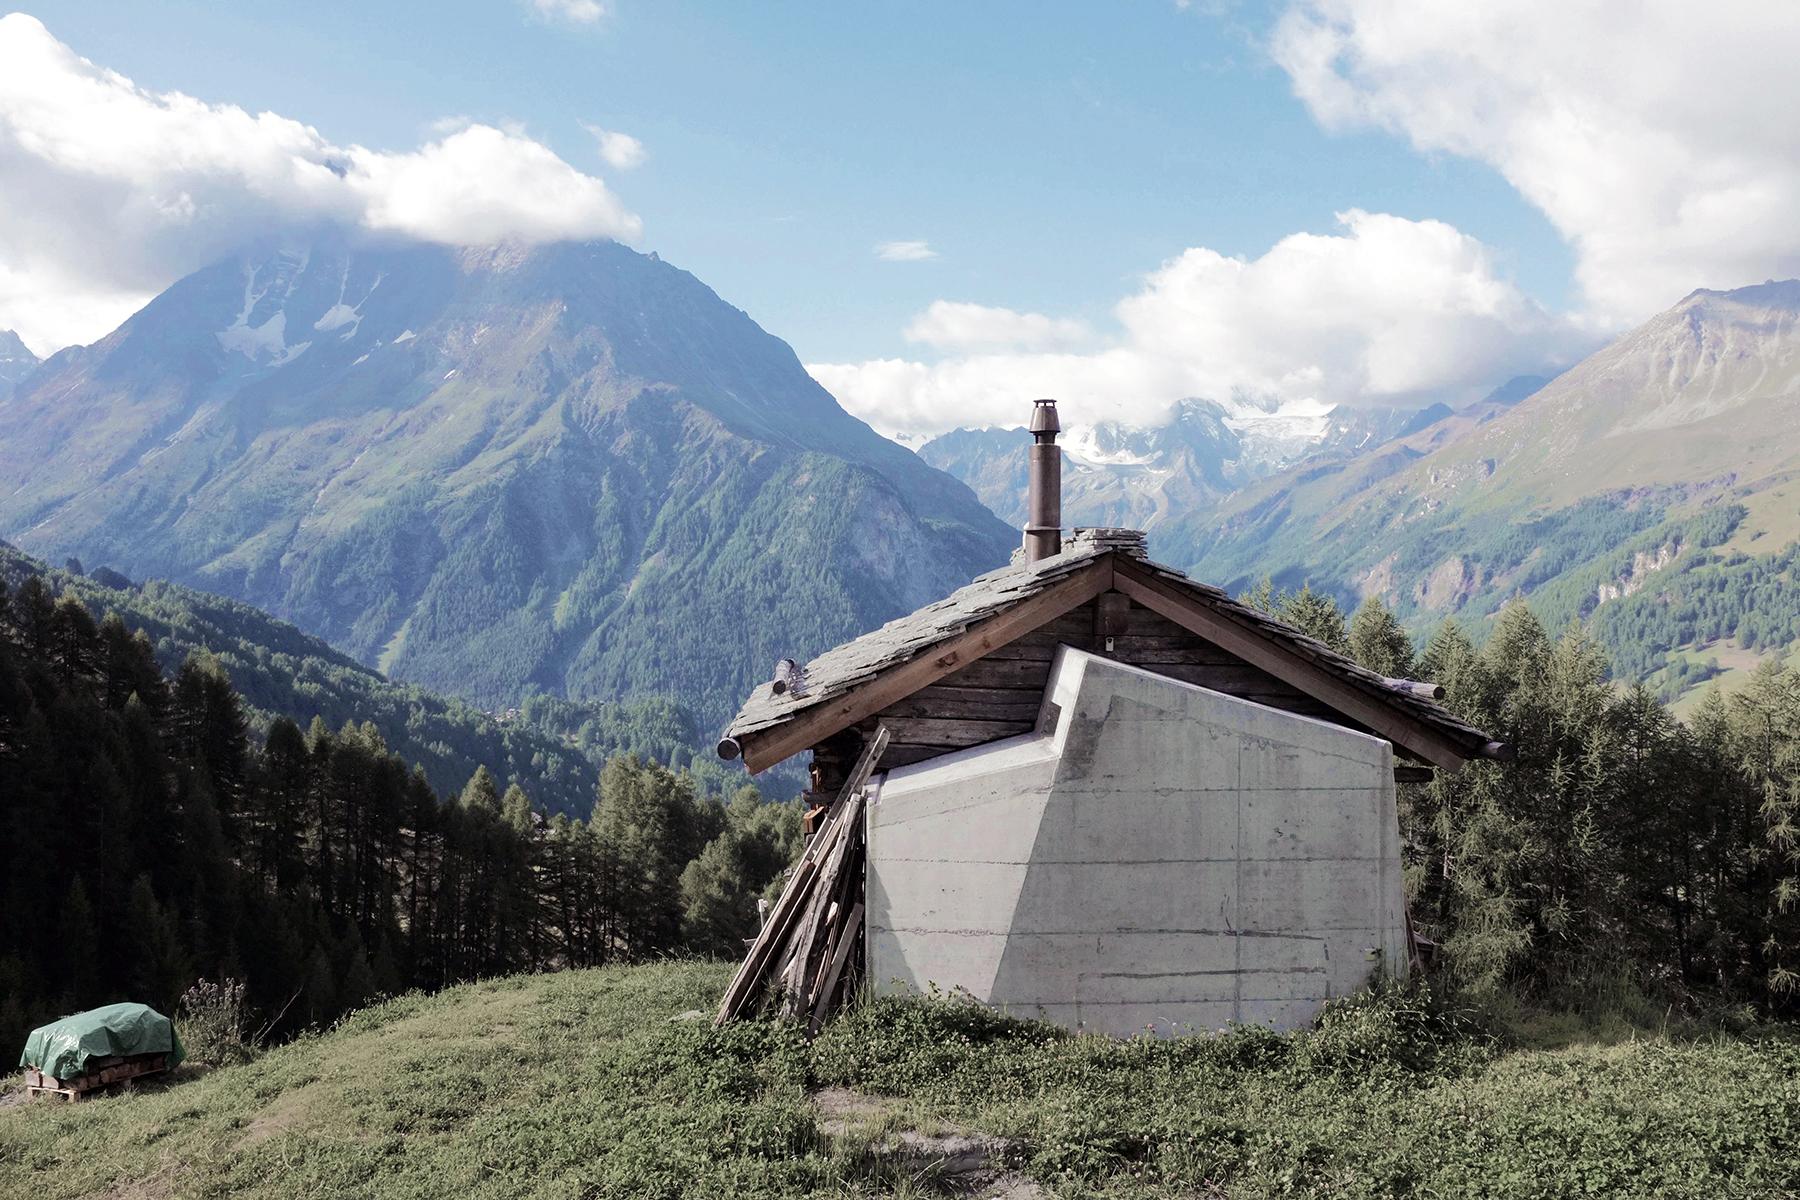 La Sage, Valais, Transformation de grange / Barn refurbishment, Burrus Nussbaumer Architectes